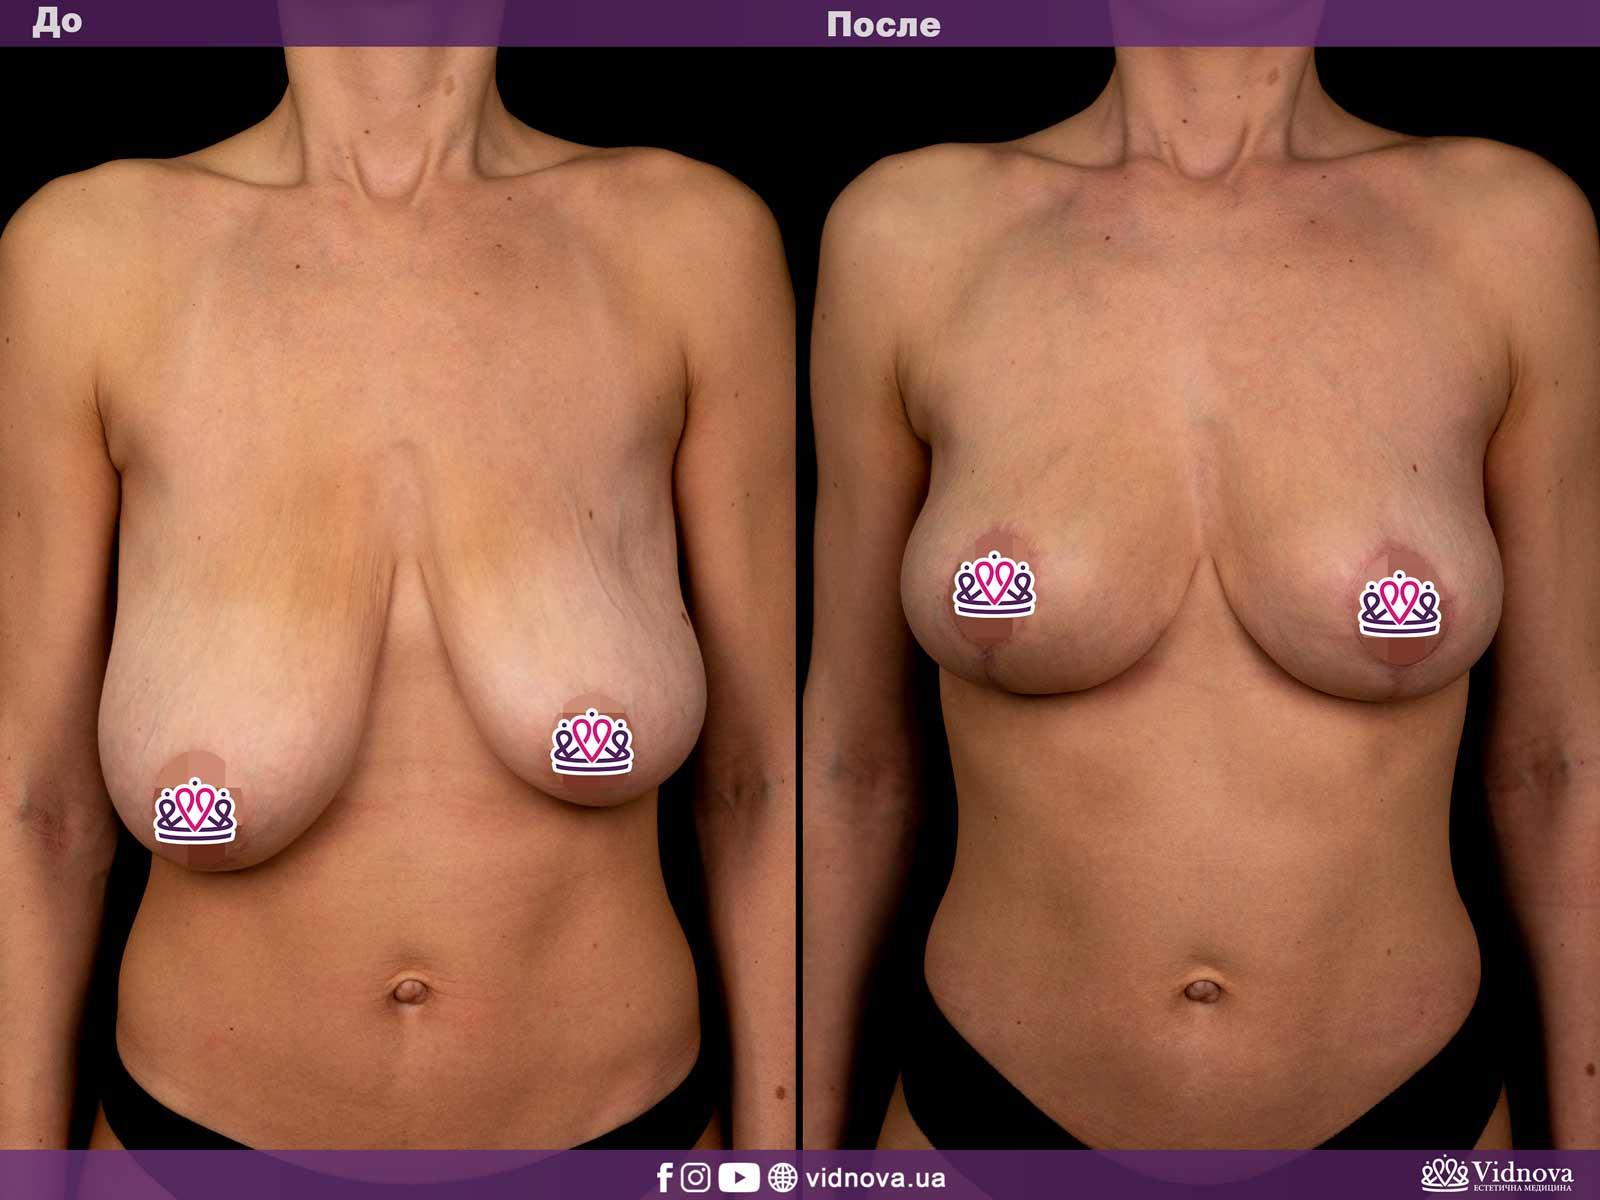 Подтяжка груди: Фото ДО и ПОСЛЕ - Пример №5-1 - Клиника Vidnova